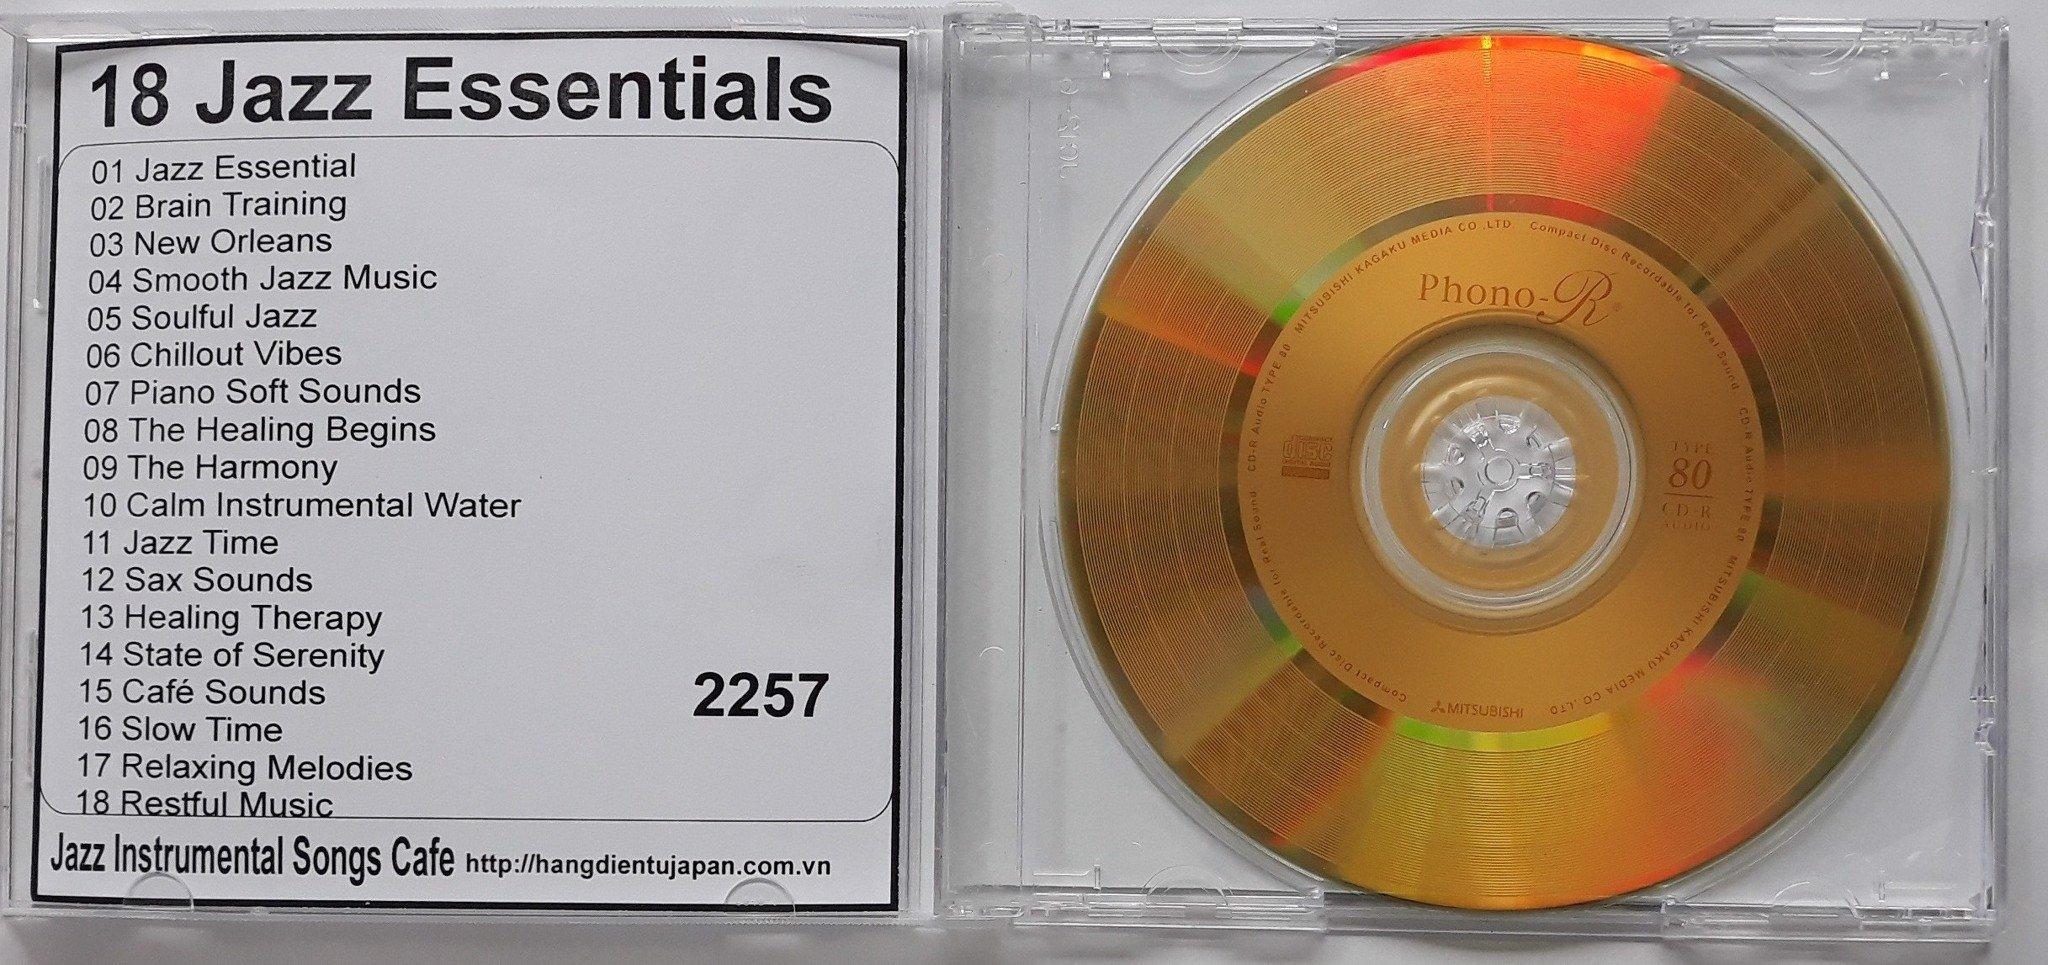 2257 Jazz Instrumental Songs Cafe - 18 Jazz Essentials - The Very